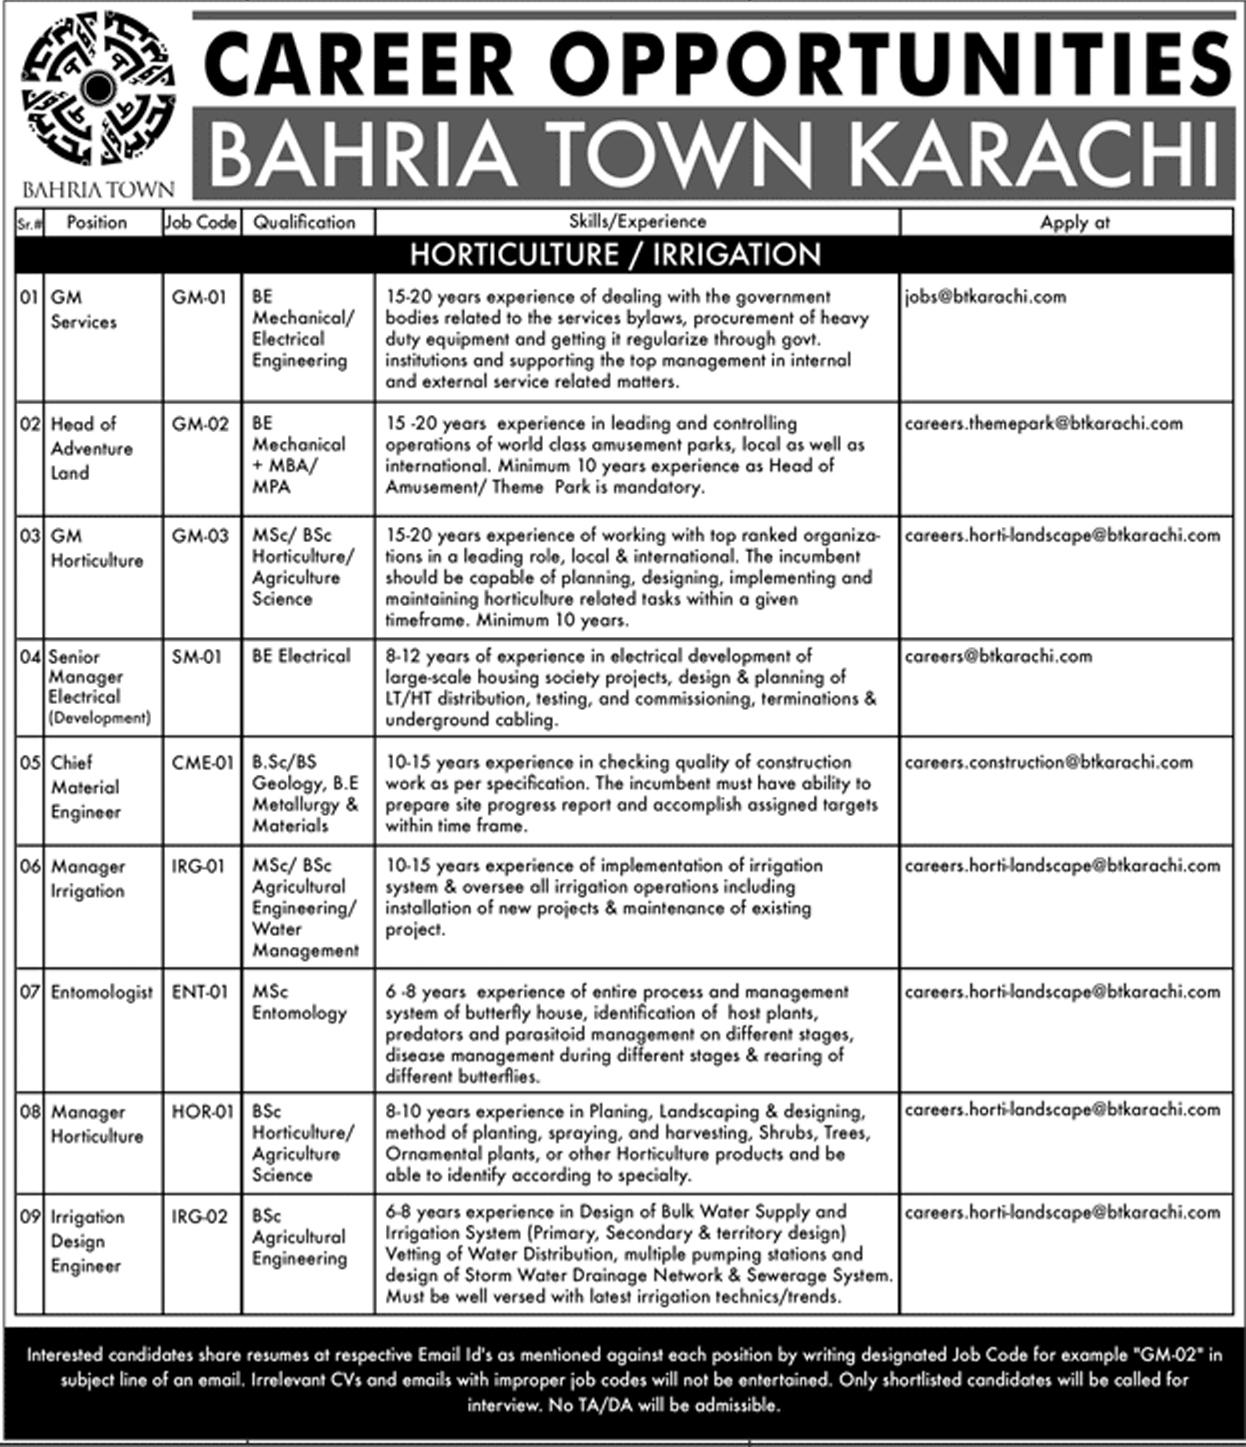 Jobs in Bahria Town Private Limited, Karachi - Jobs in Pakistan